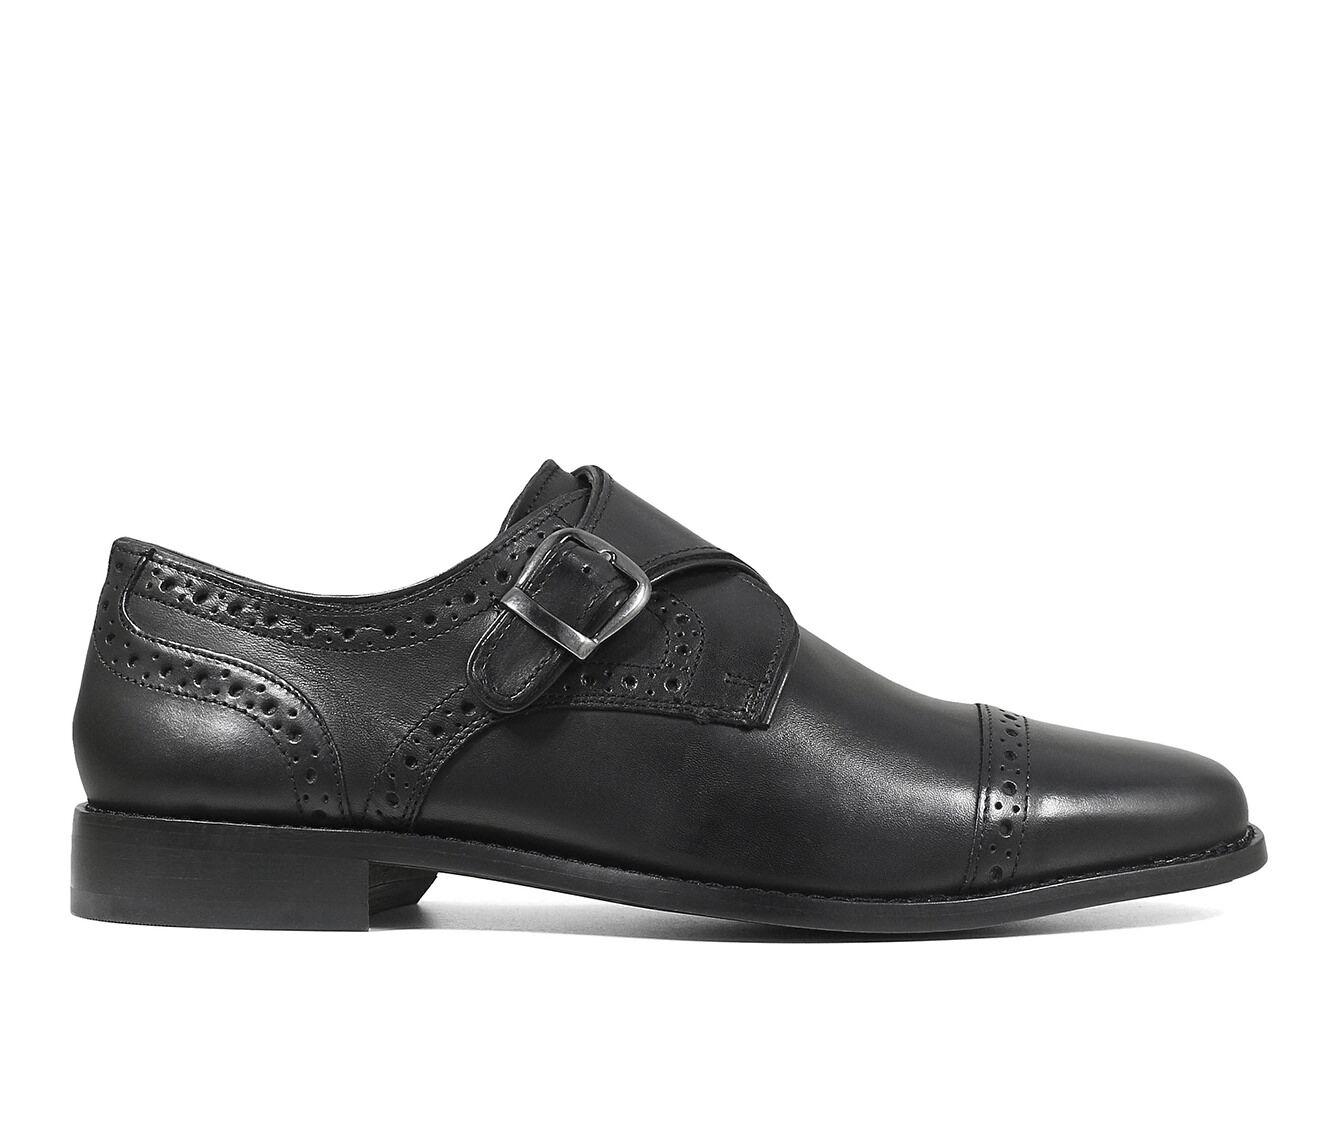 Men's Nunn Bush Newton Cap Toe Monk Strap Dress Shoes Black